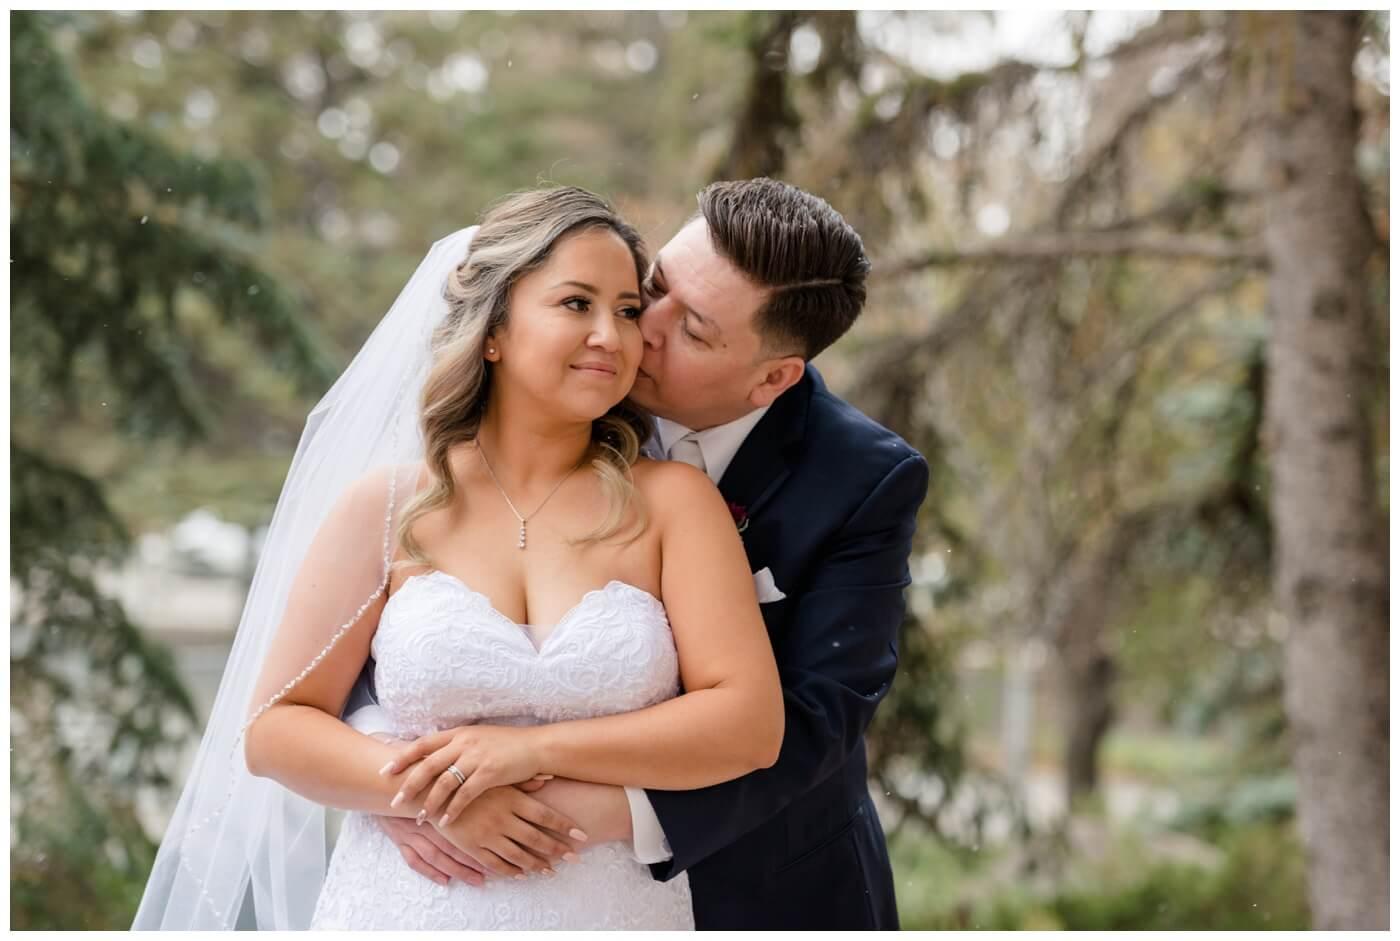 Regina Wedding Photographer - Laurie - Destiny - Fall Wedding - TC Douglas Building - Pine Trees - Falling Snow